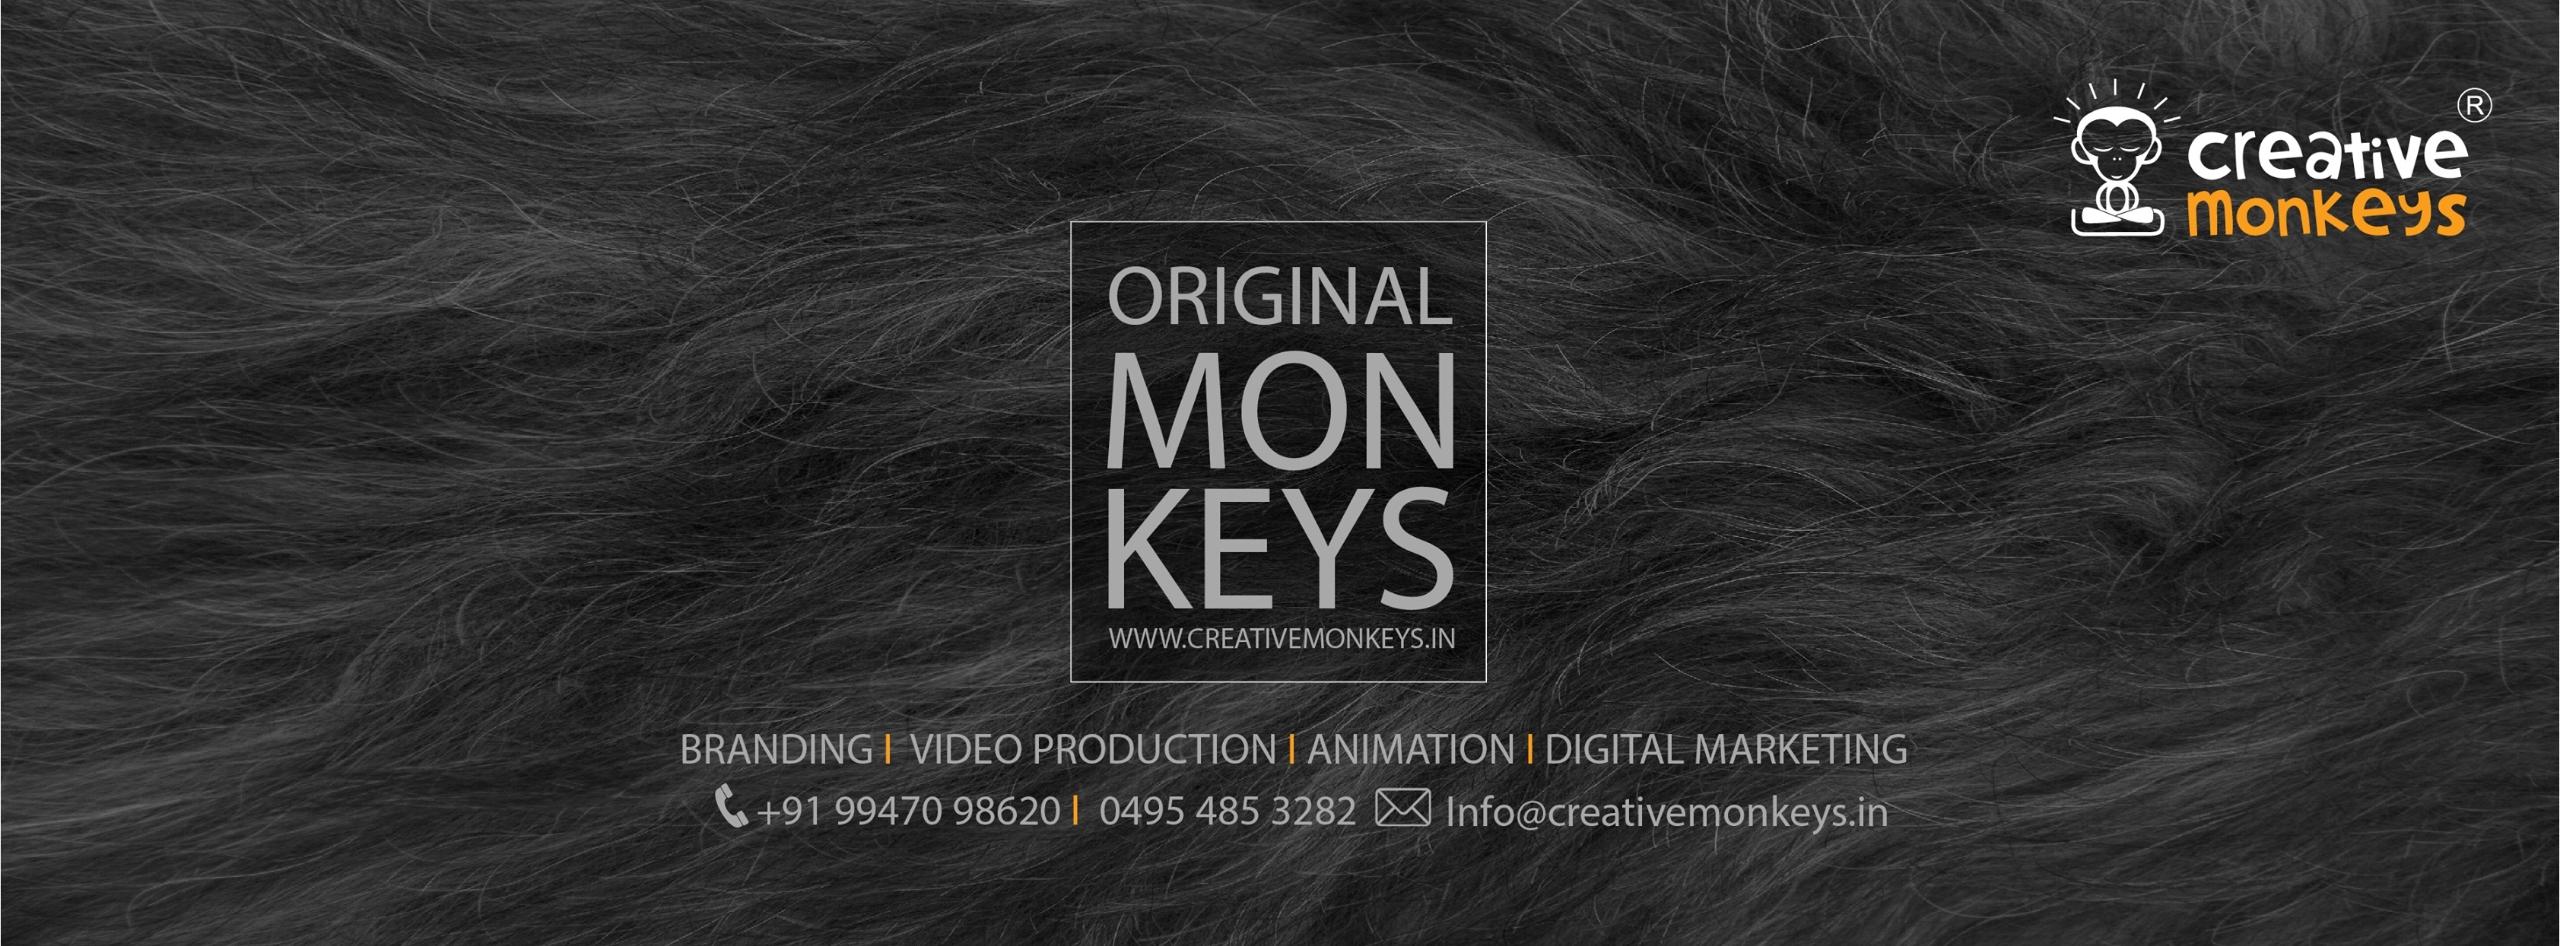 creativemonkeys (@creativemonkeys) Cover Image